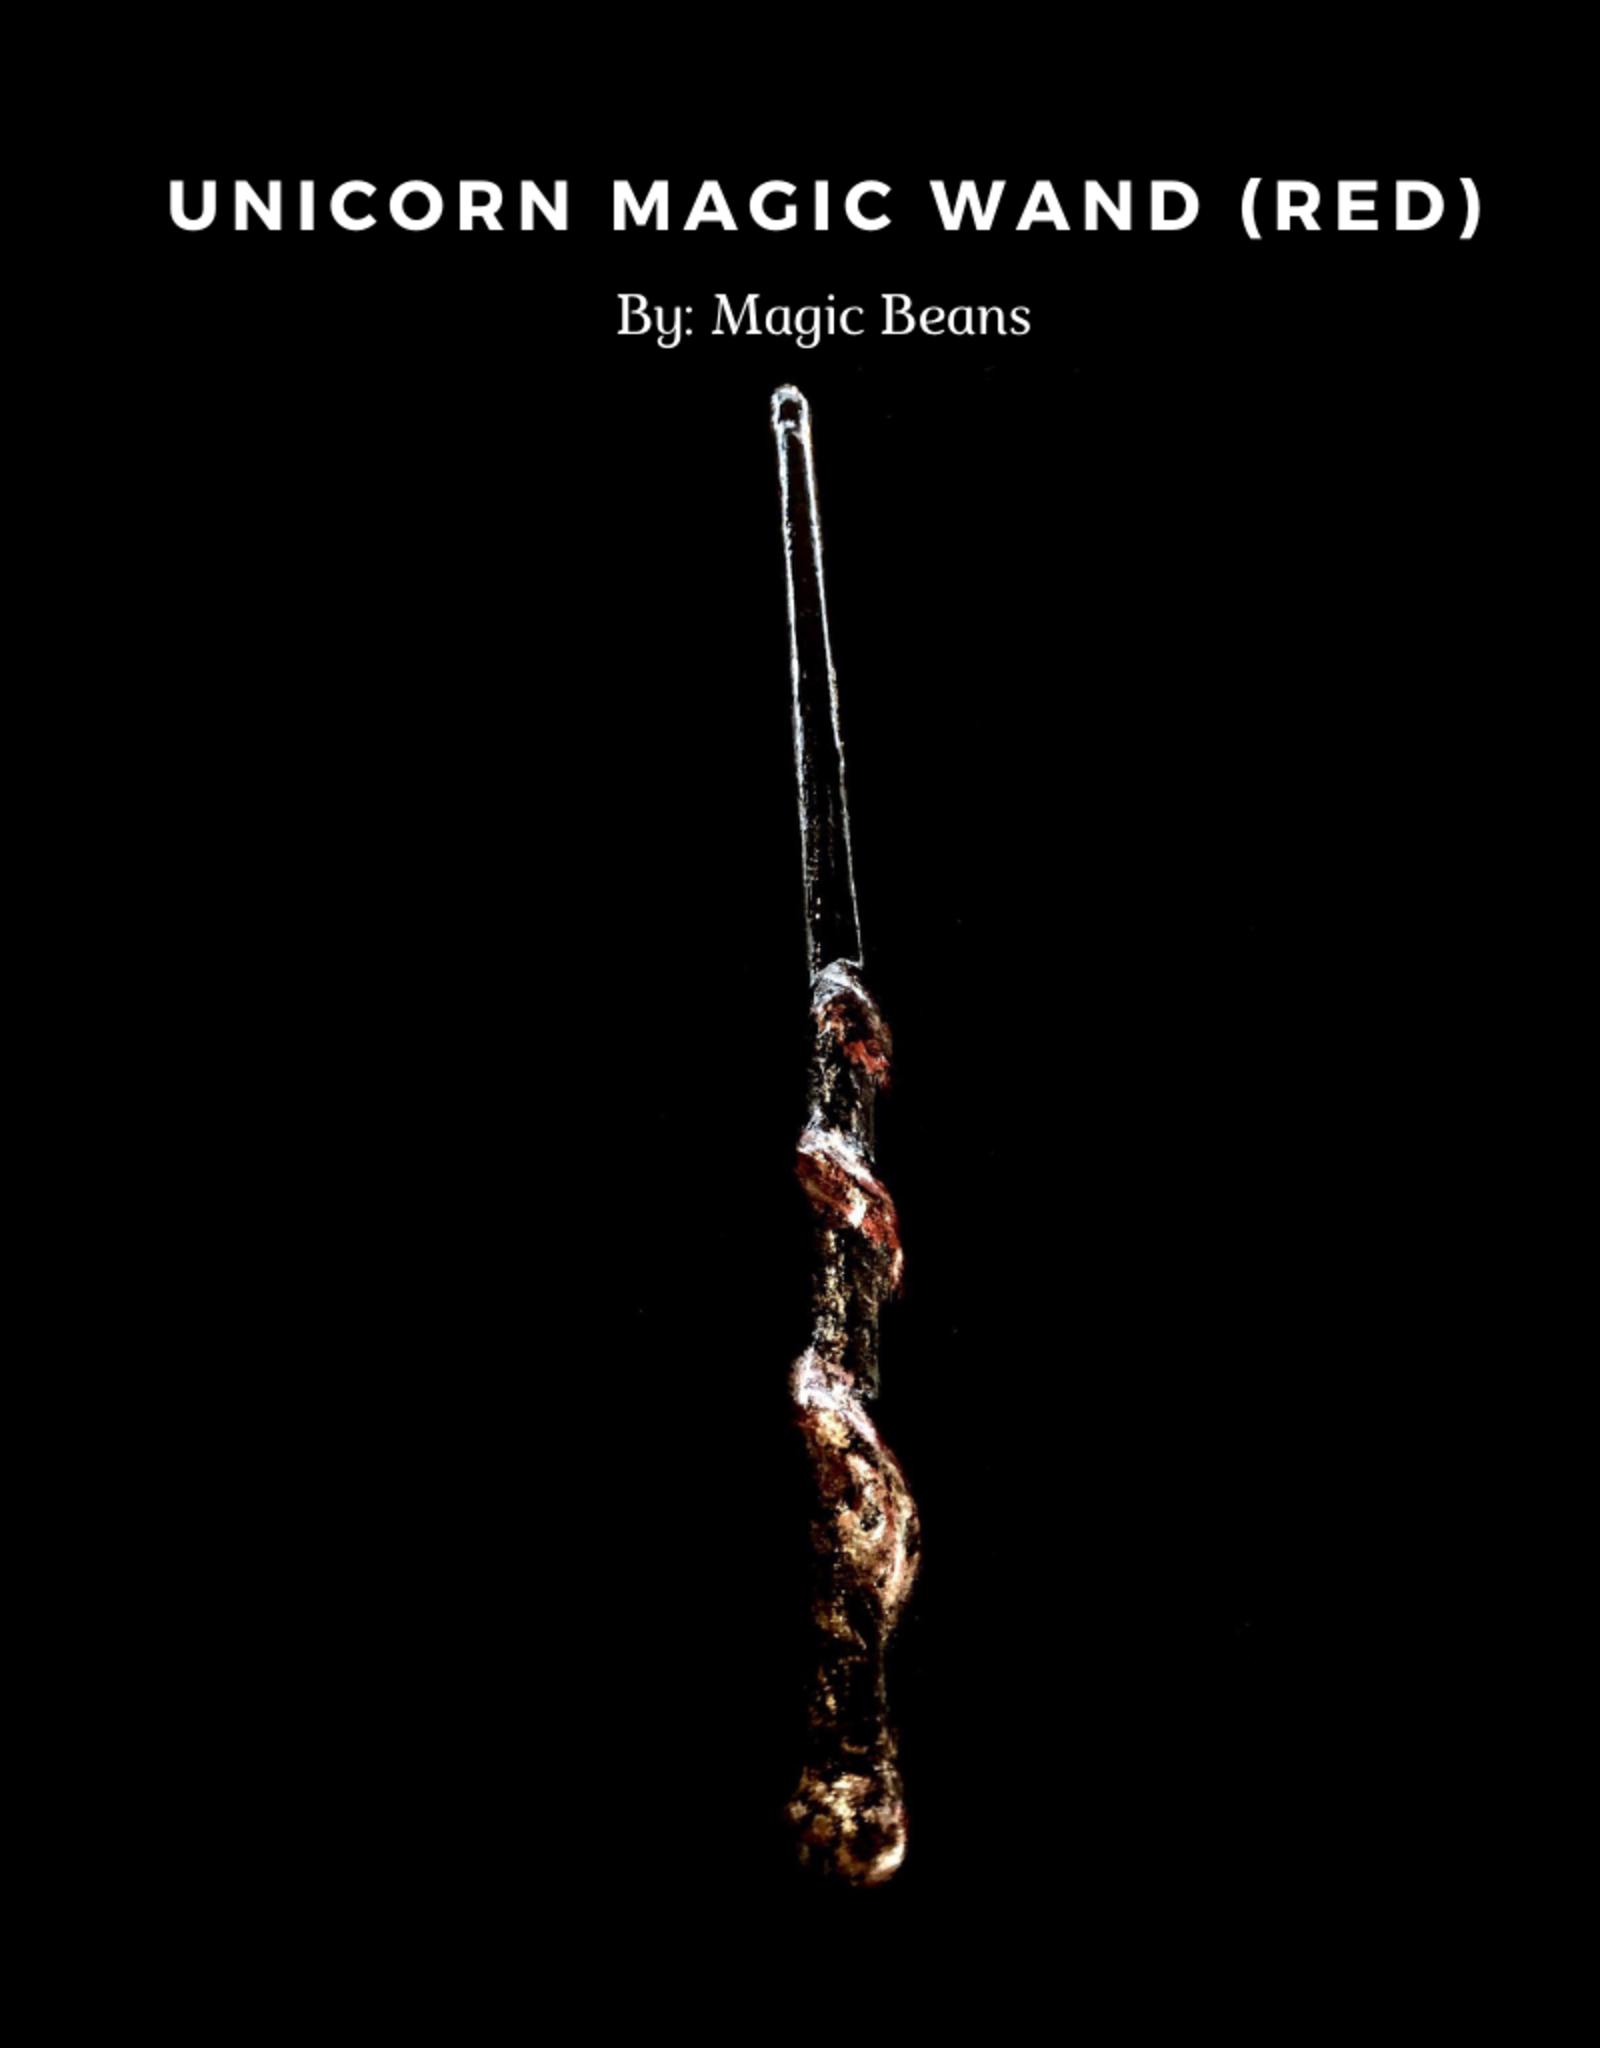 magic beans Premium Magic Wands